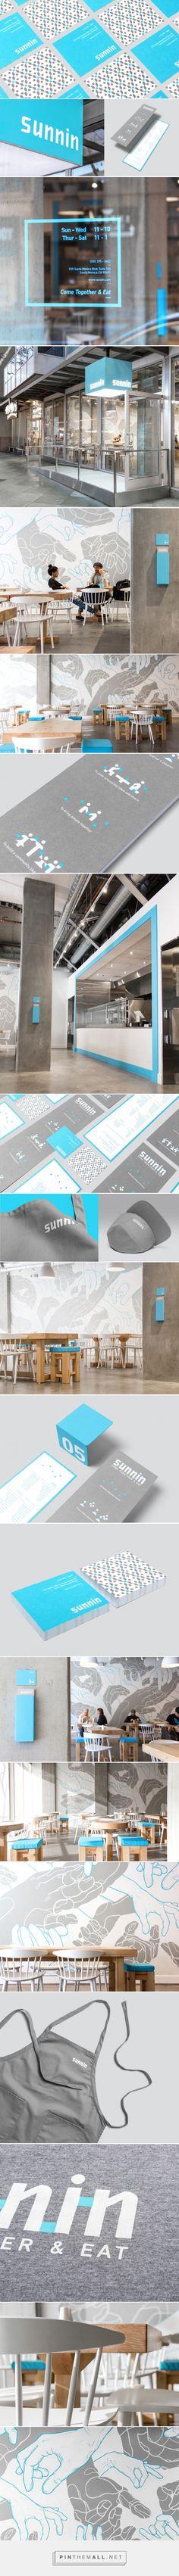 Forth + Back Studio | Sunnin